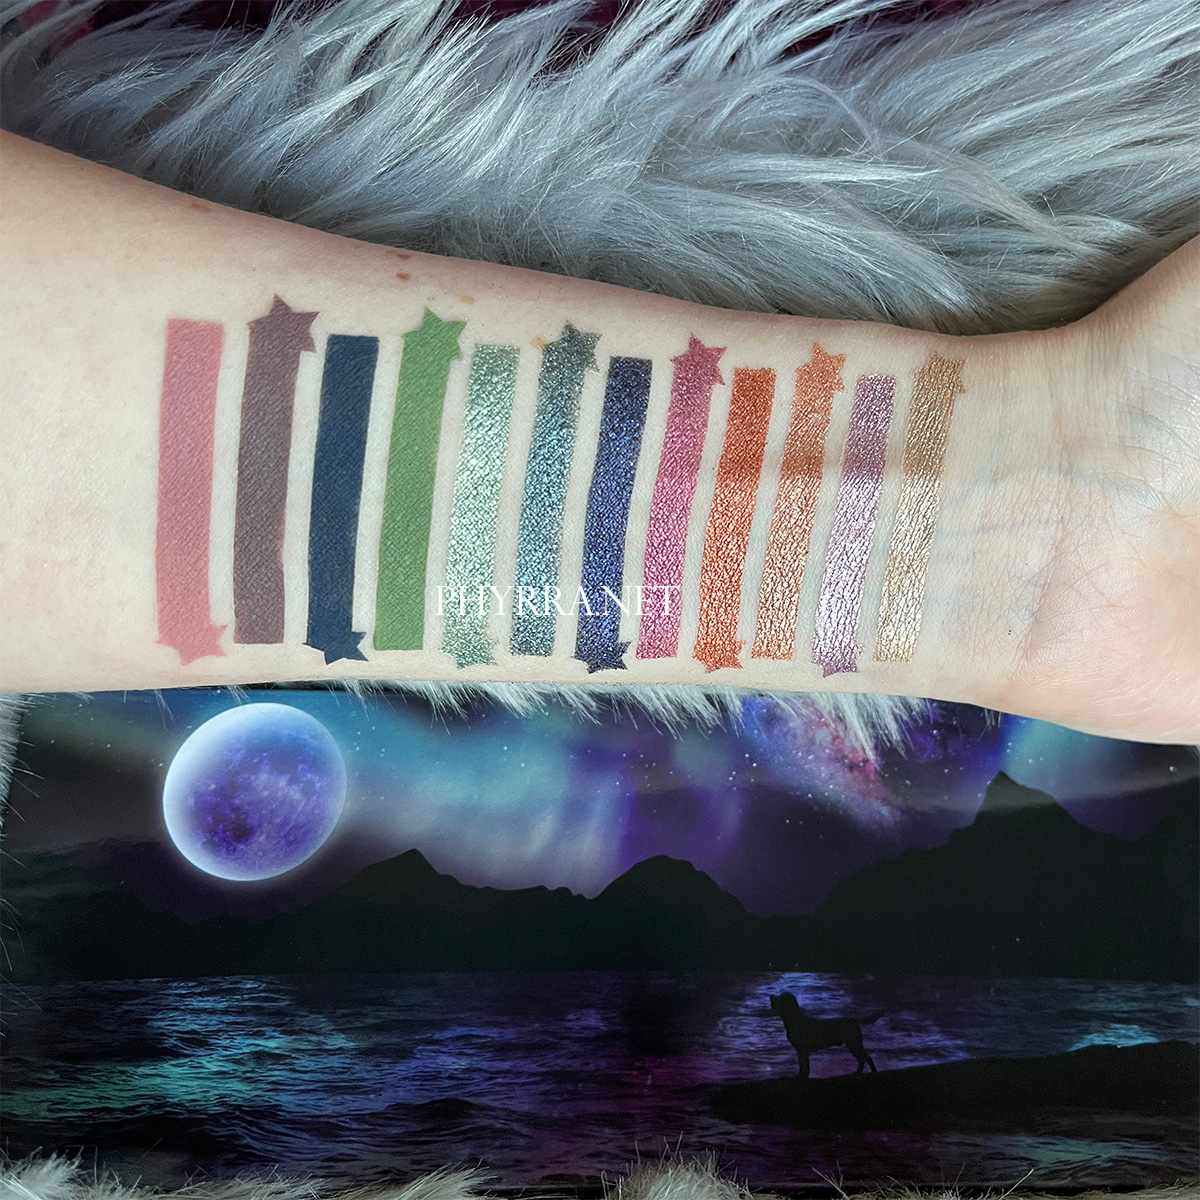 Sydney Grace Co Temptalia On the Horizon Palette Swatches on Light Skin